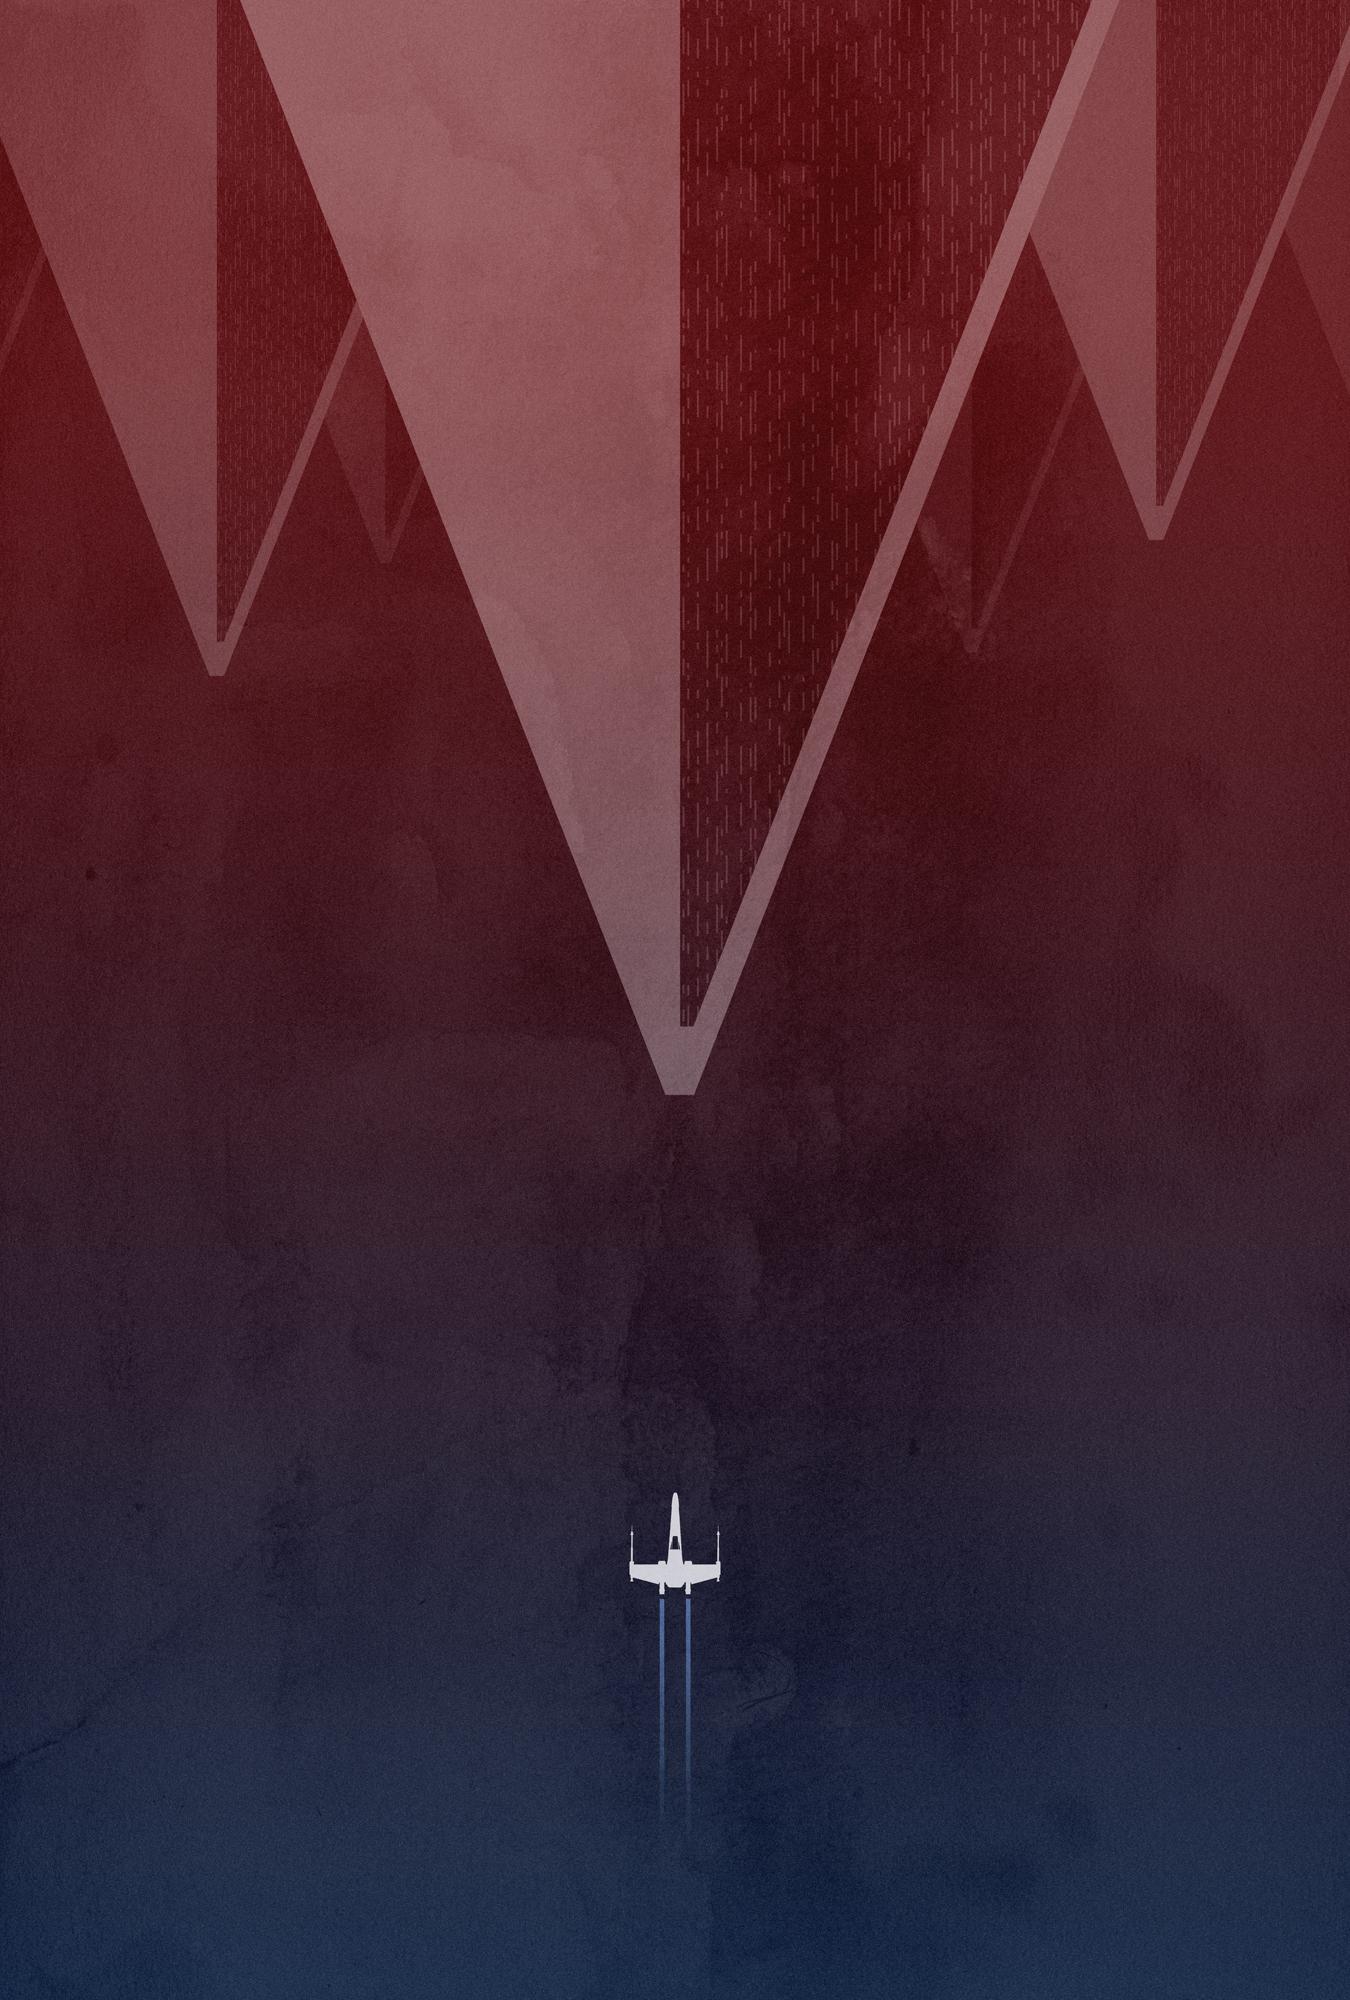 A minimalist TROS poster